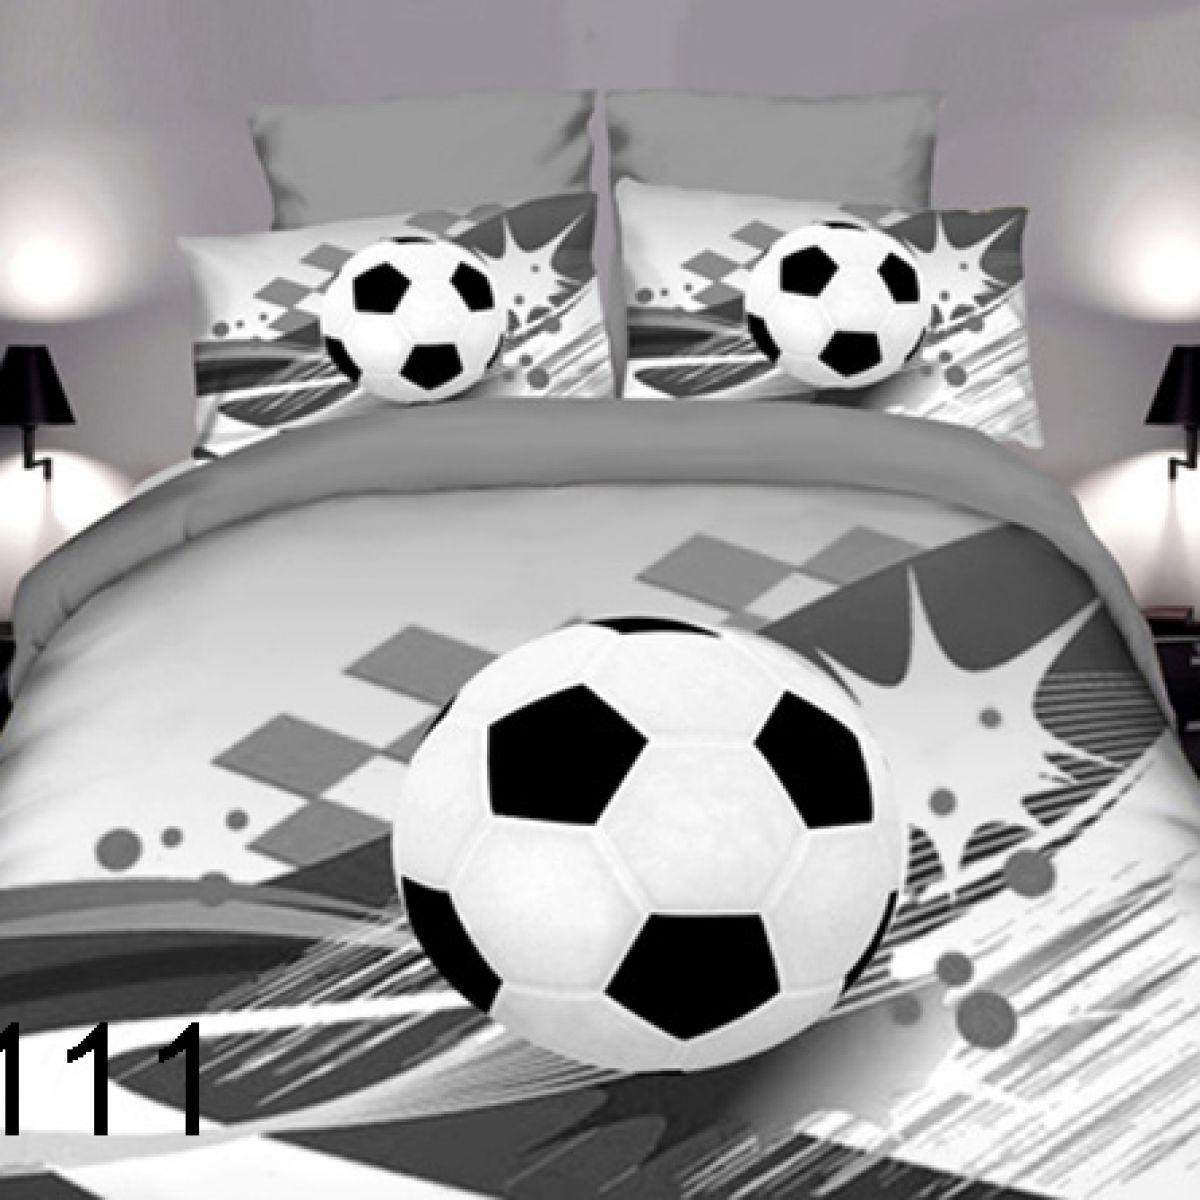 3D Beddings - Antonio - AML-111- 160x200 cm - 4 pcs